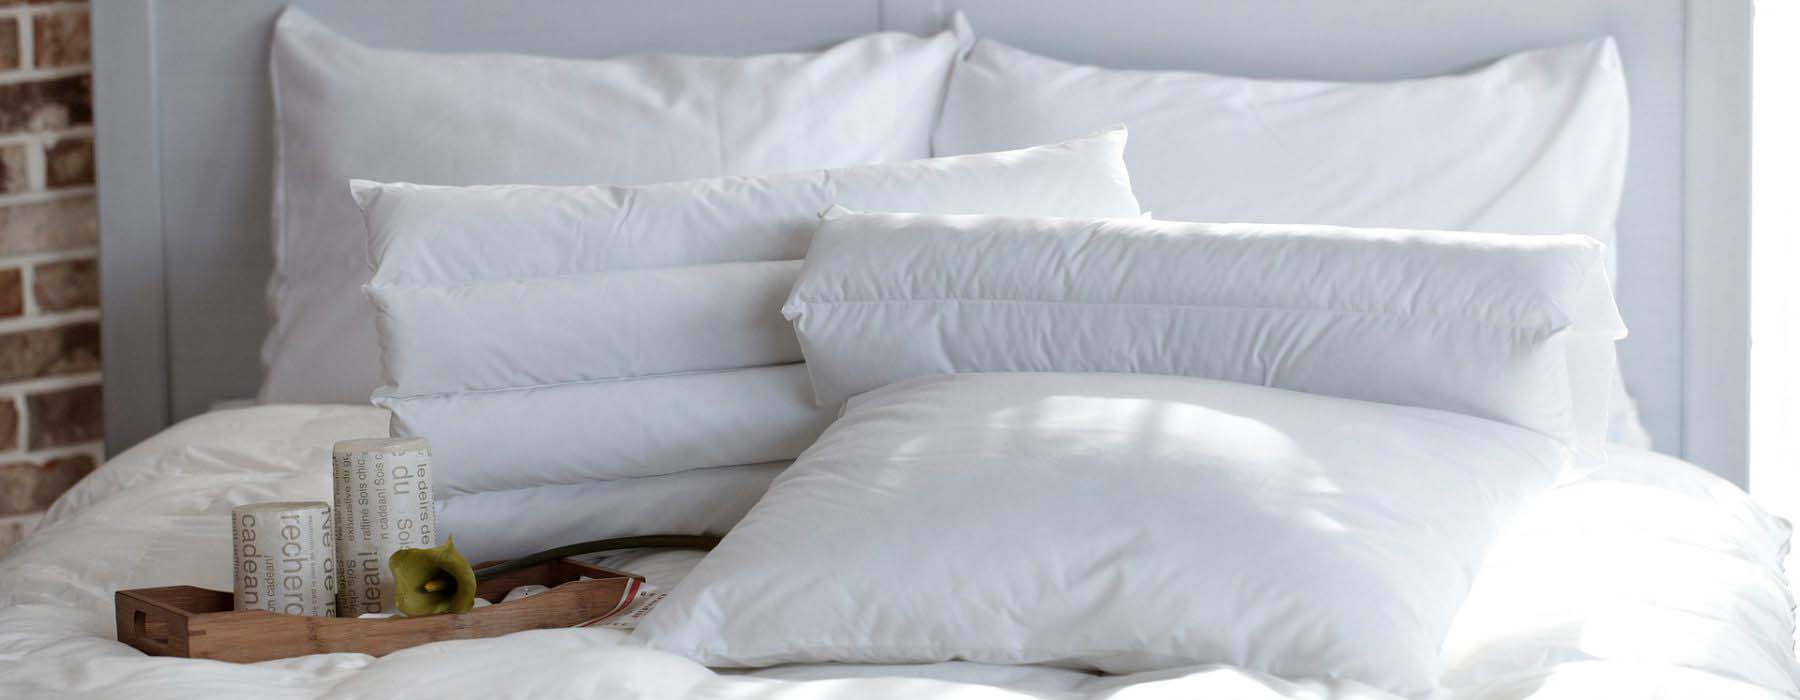 Remedios para no roncar